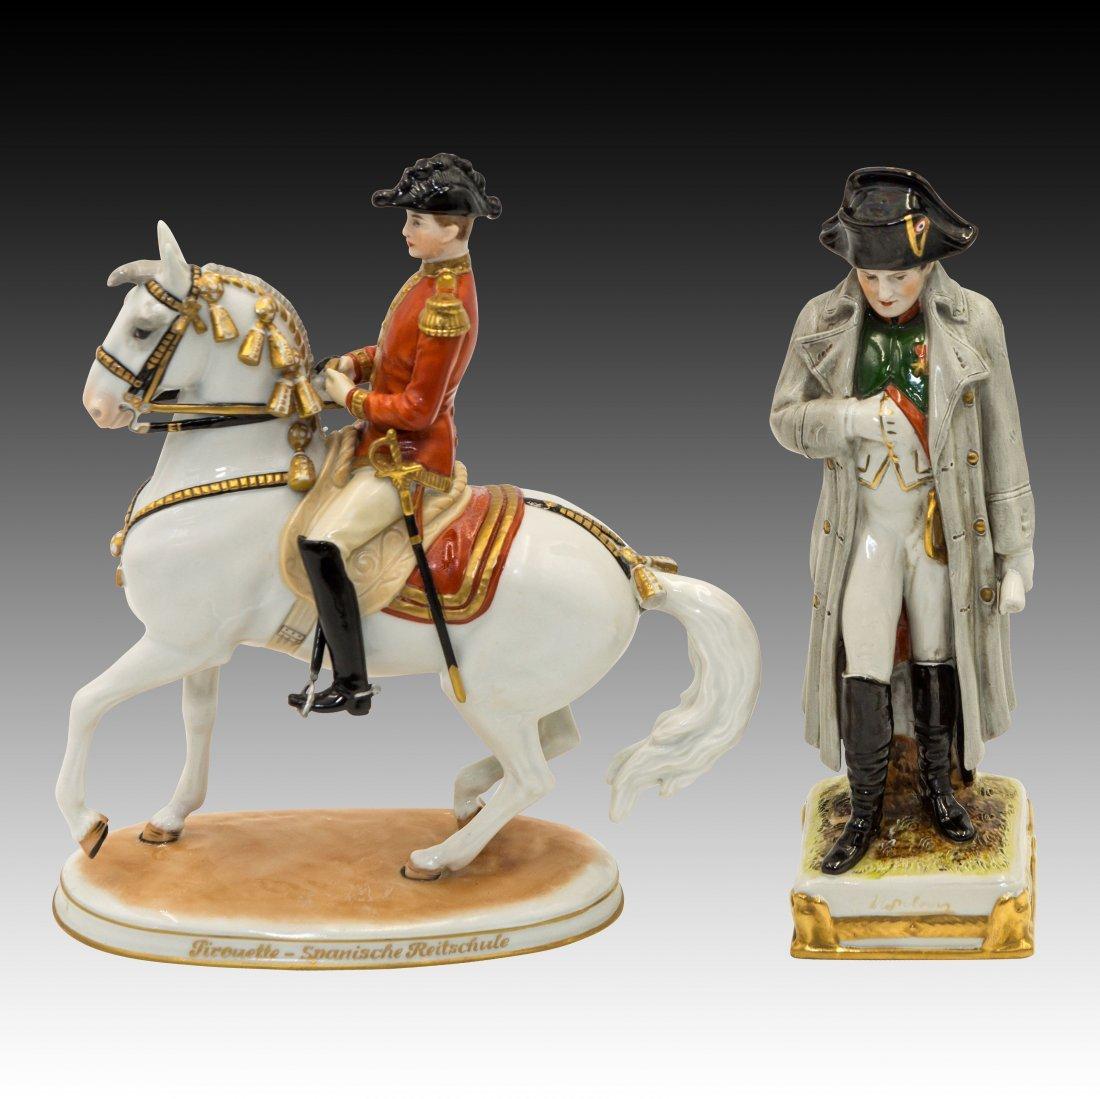 2 Figurines Napoleon and Ticouette